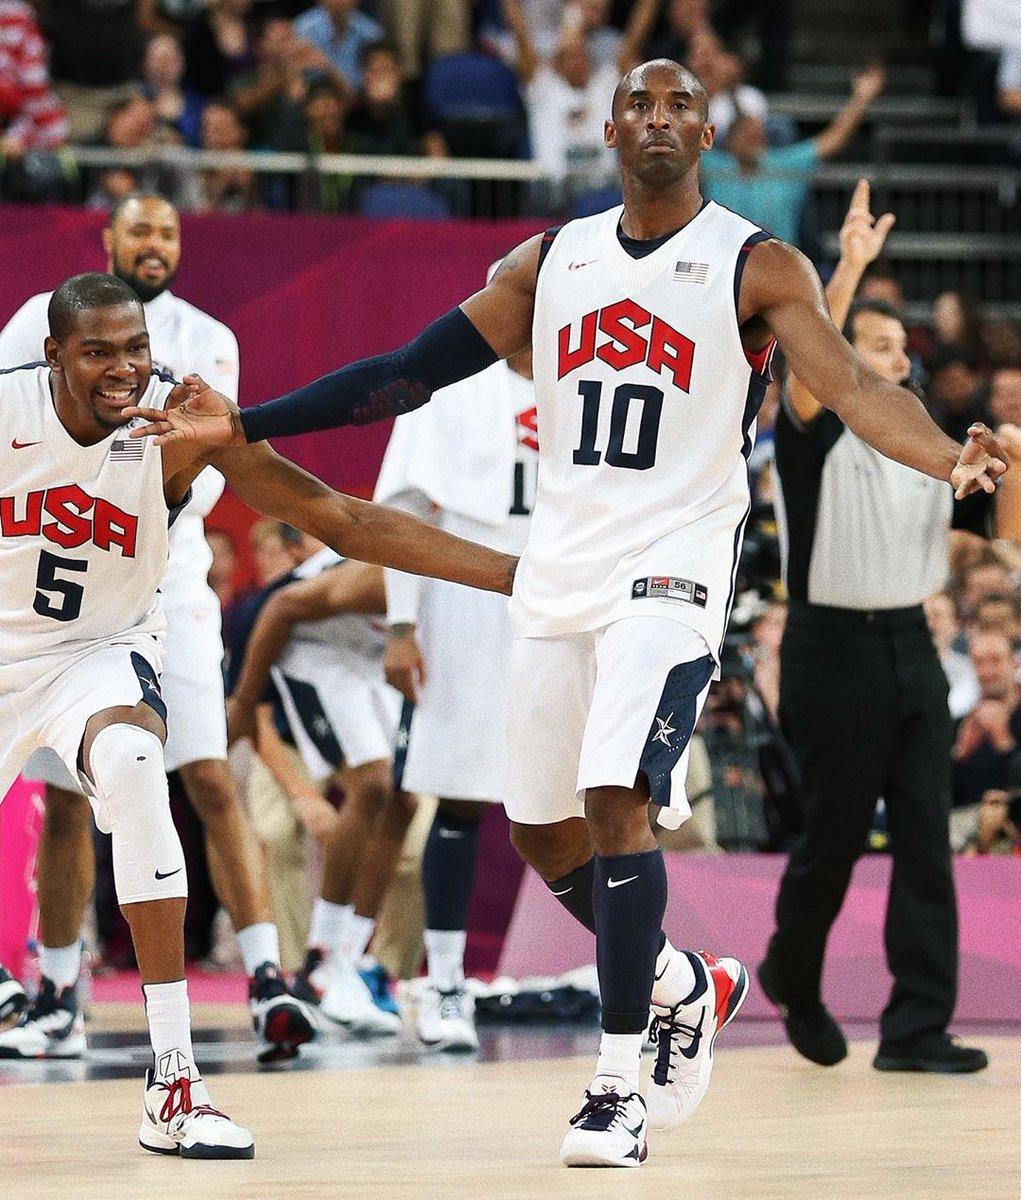 Nike Kobe 7 'USA' 🇺🇸